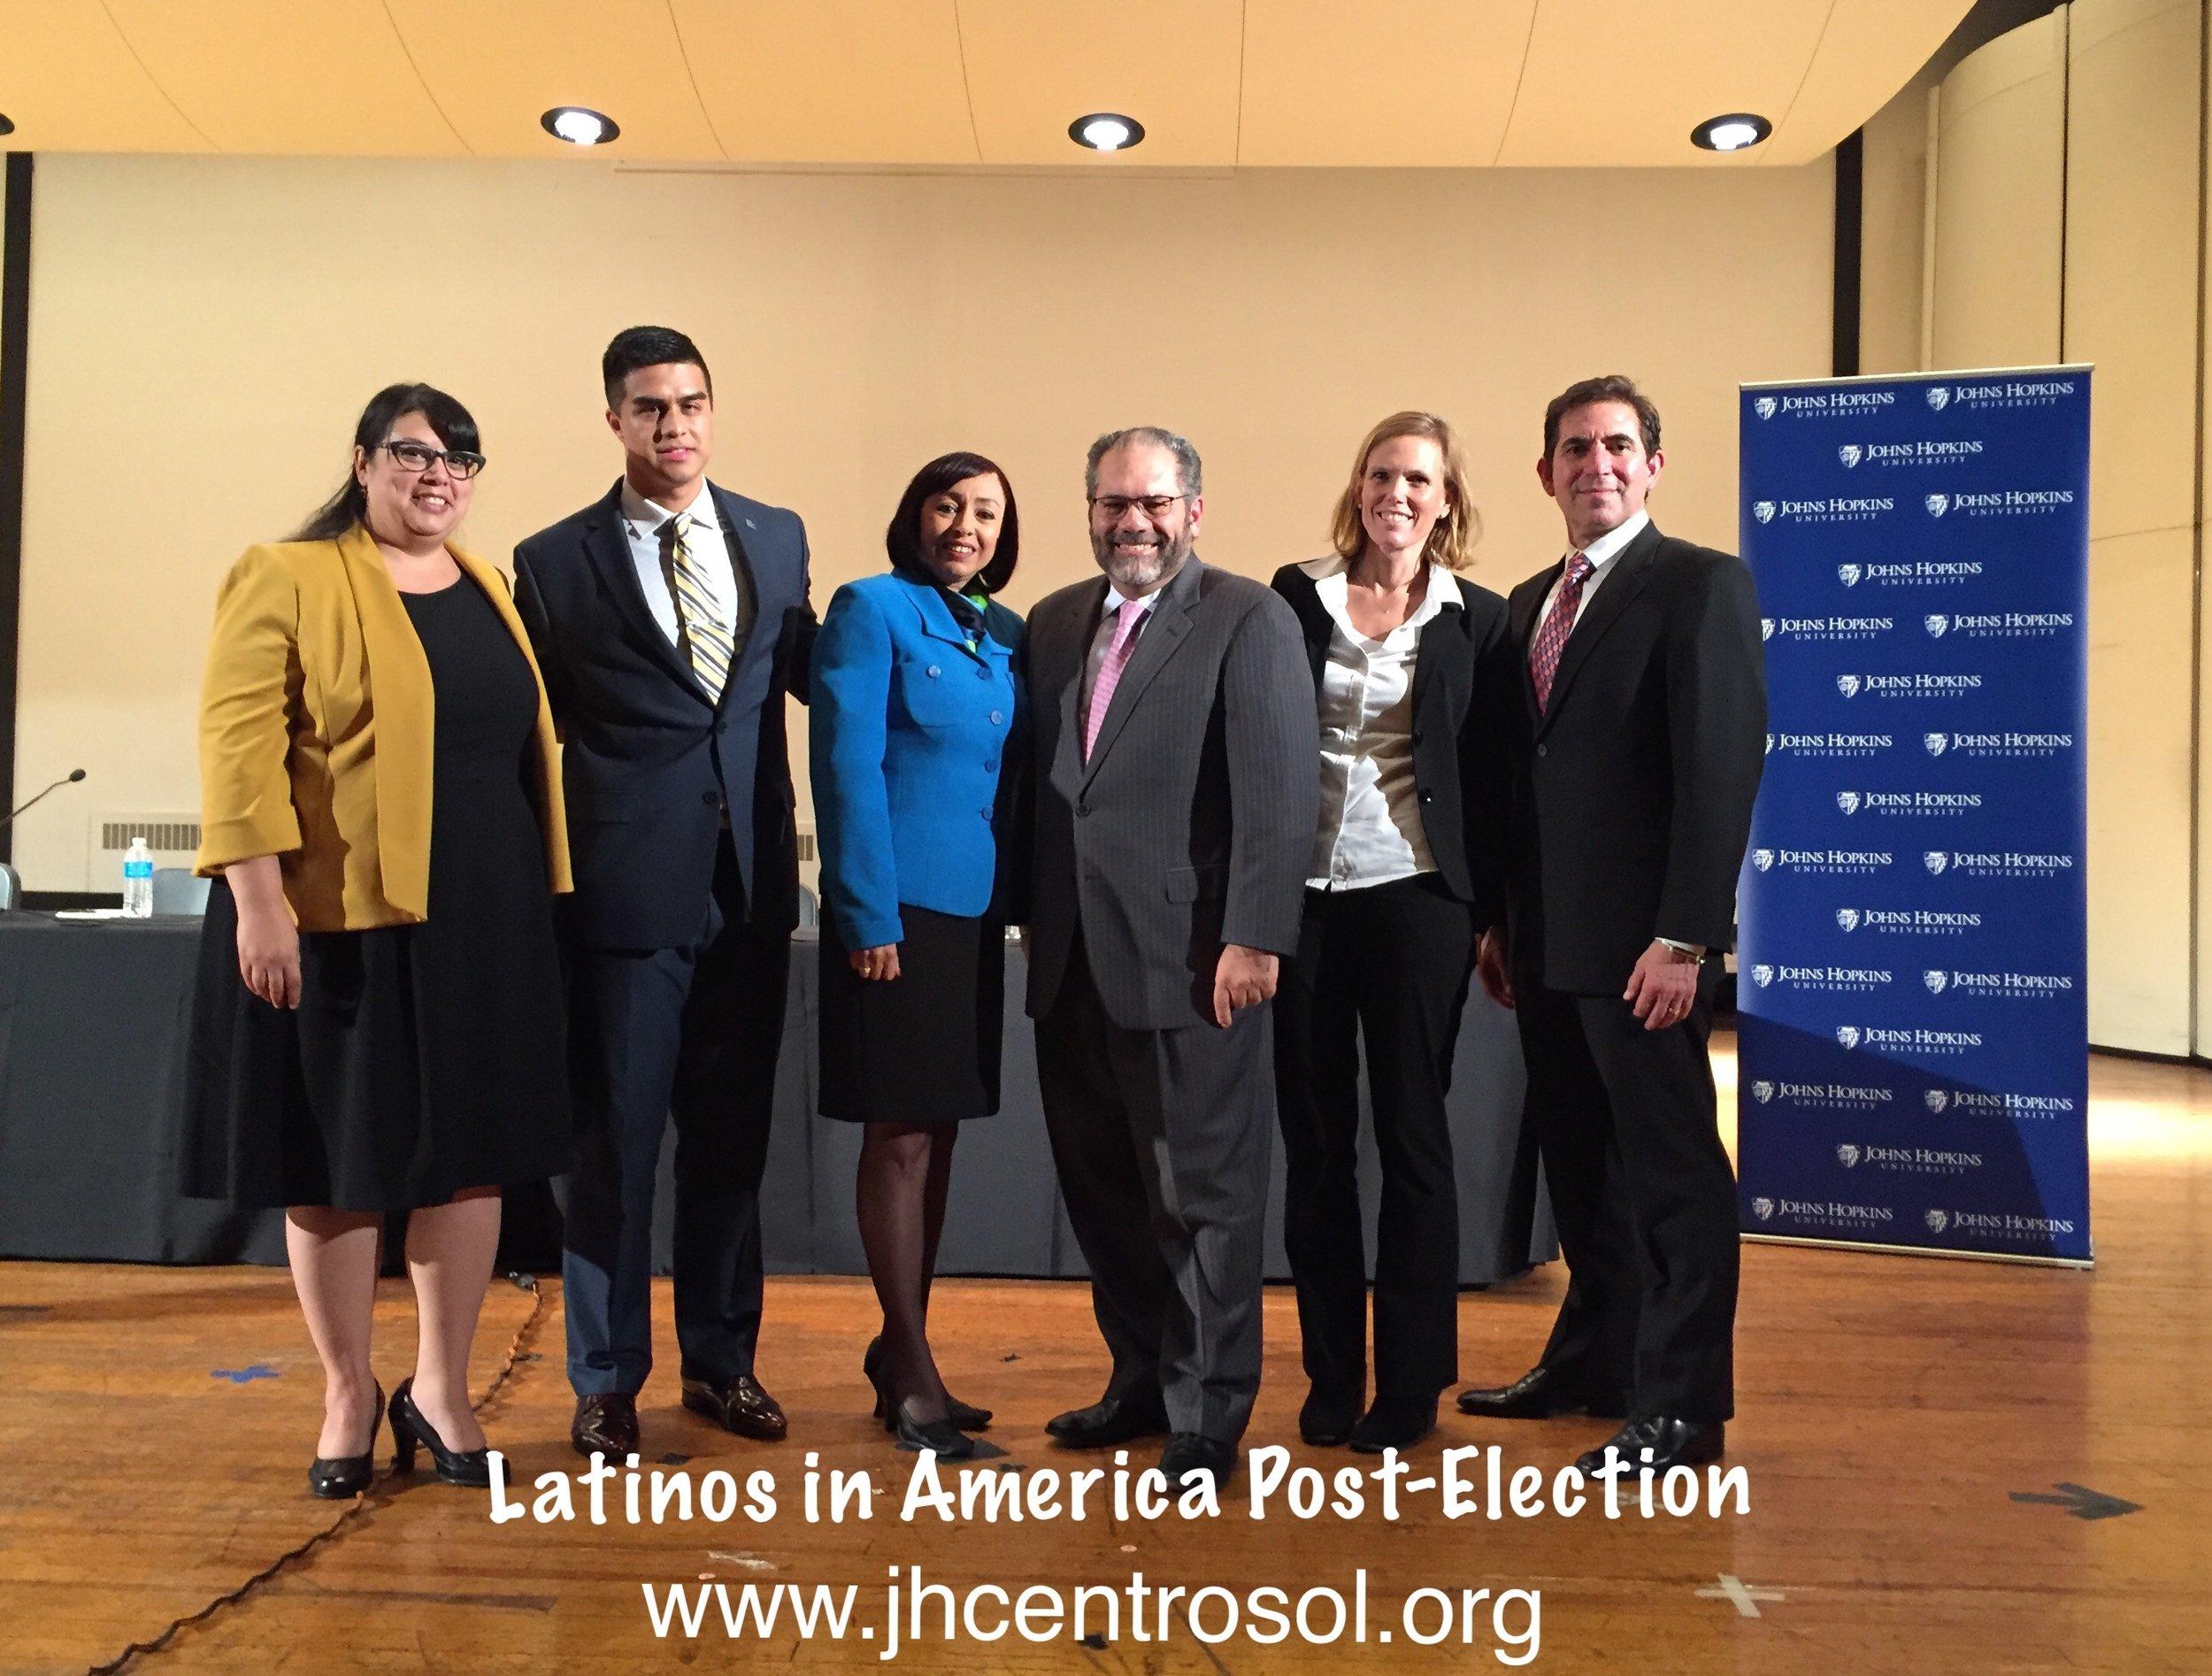 Latinos-in-America-forum-11.30.2016.jpg